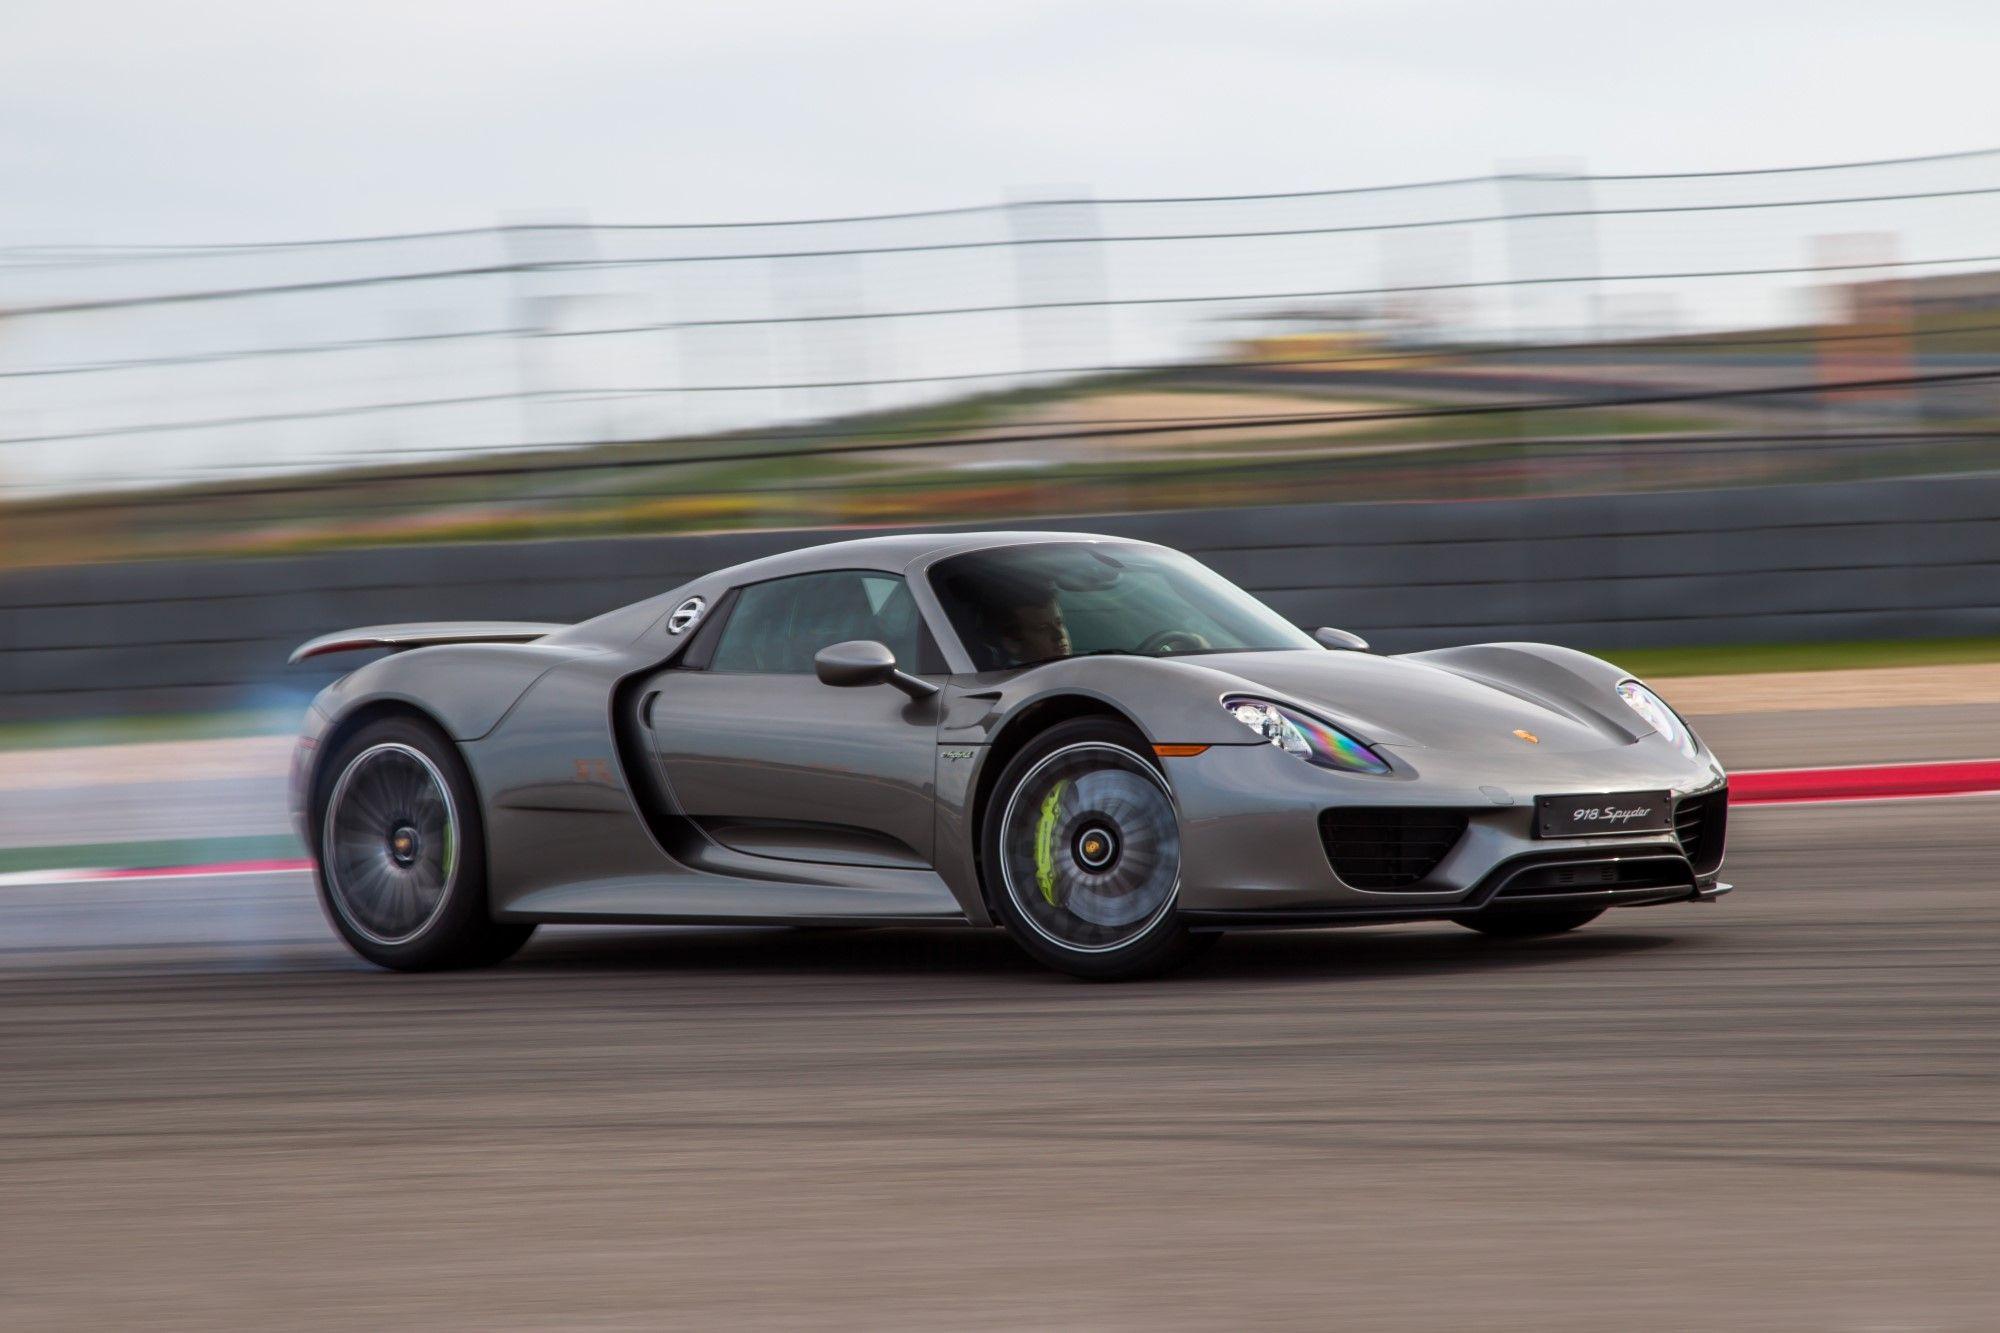 2a01e9ffd6c5e943ce49c4ac543d87ba Inspiring Porsche 918 Spyder Blue Flame Cars Trend